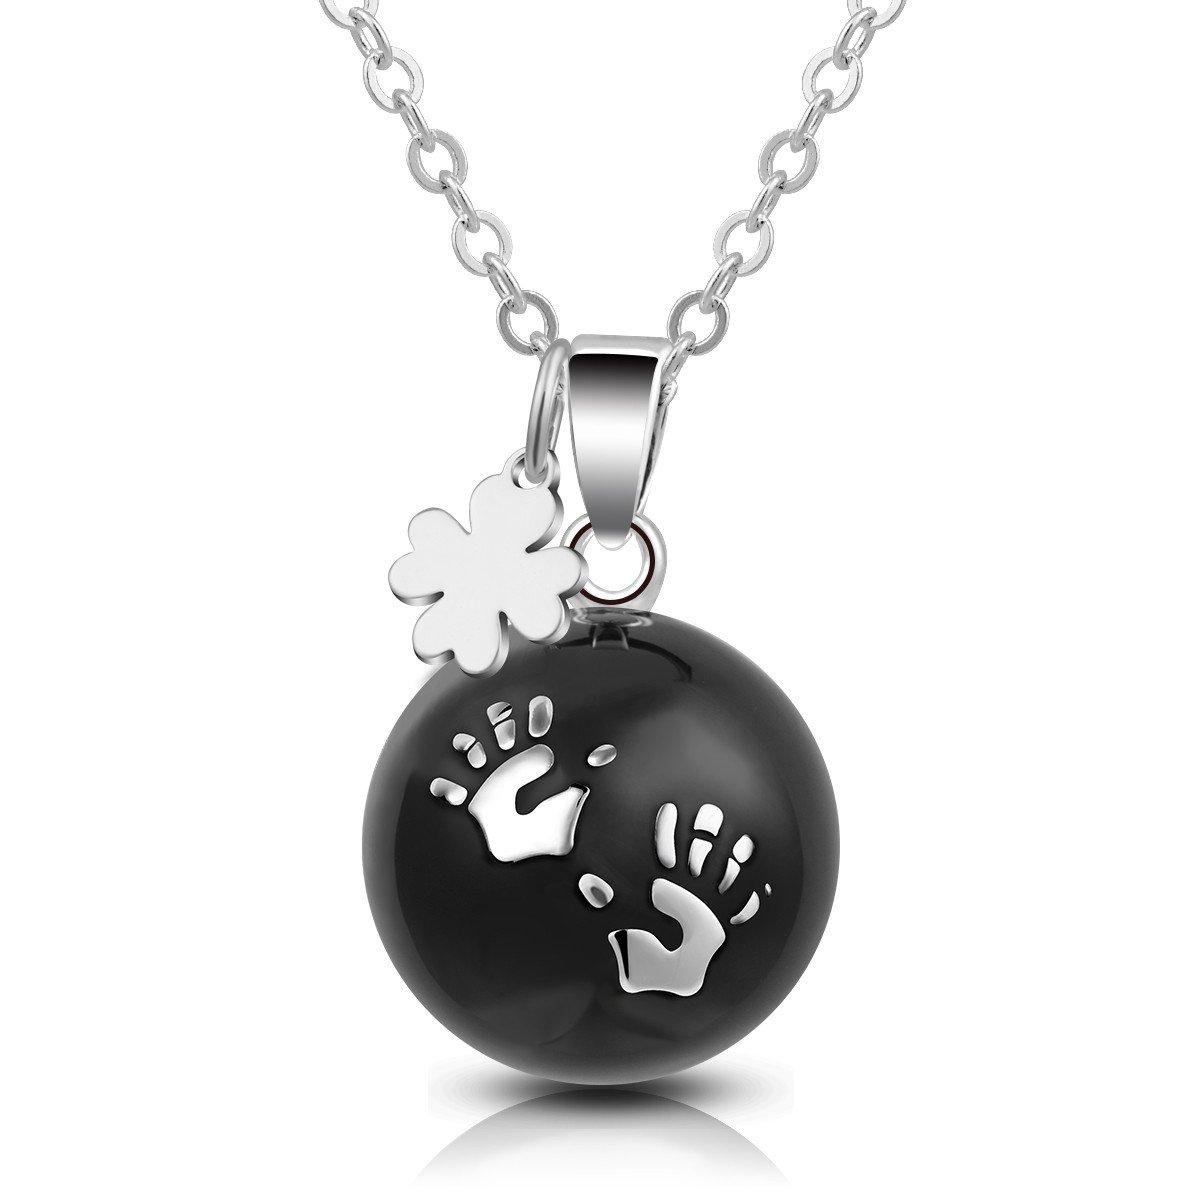 EUDORA Harmony Ball Soft Chiming Maternity Clover Charm Necklace 20mm Handprint Mexican Bola 45'' Chain